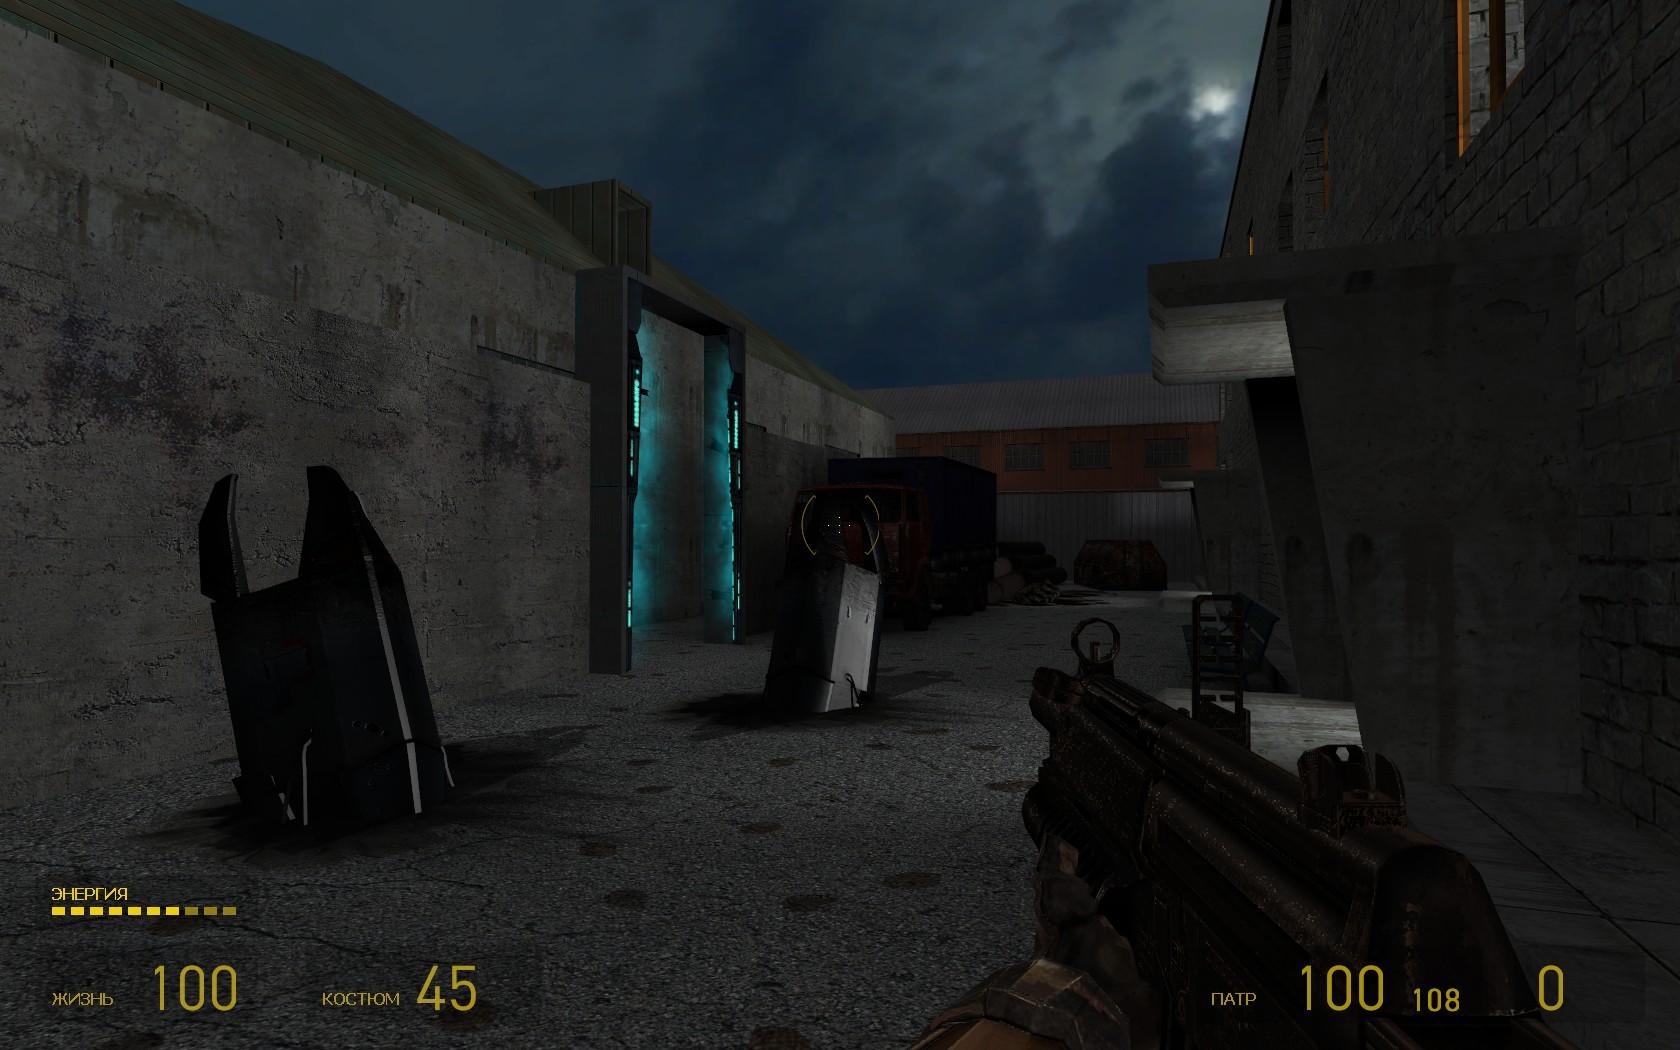 ravenholmlc20009 - Half-Life 2 ravenholmlc20009